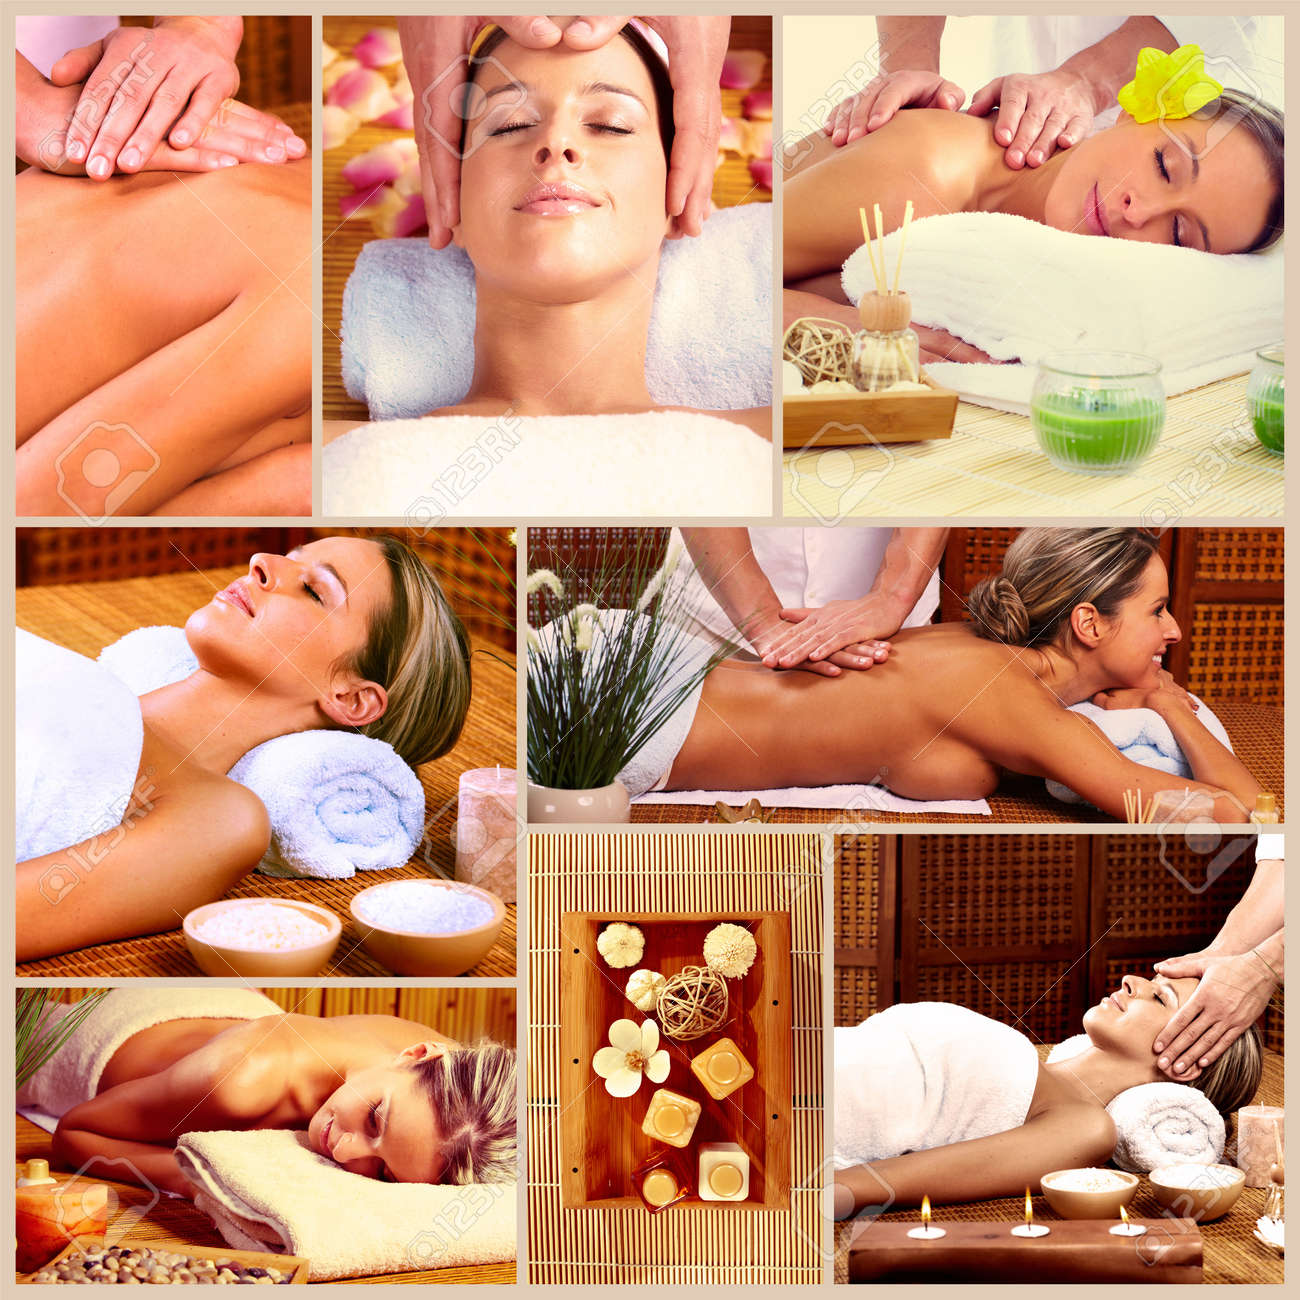 Фото інцест масаж 20 фотография